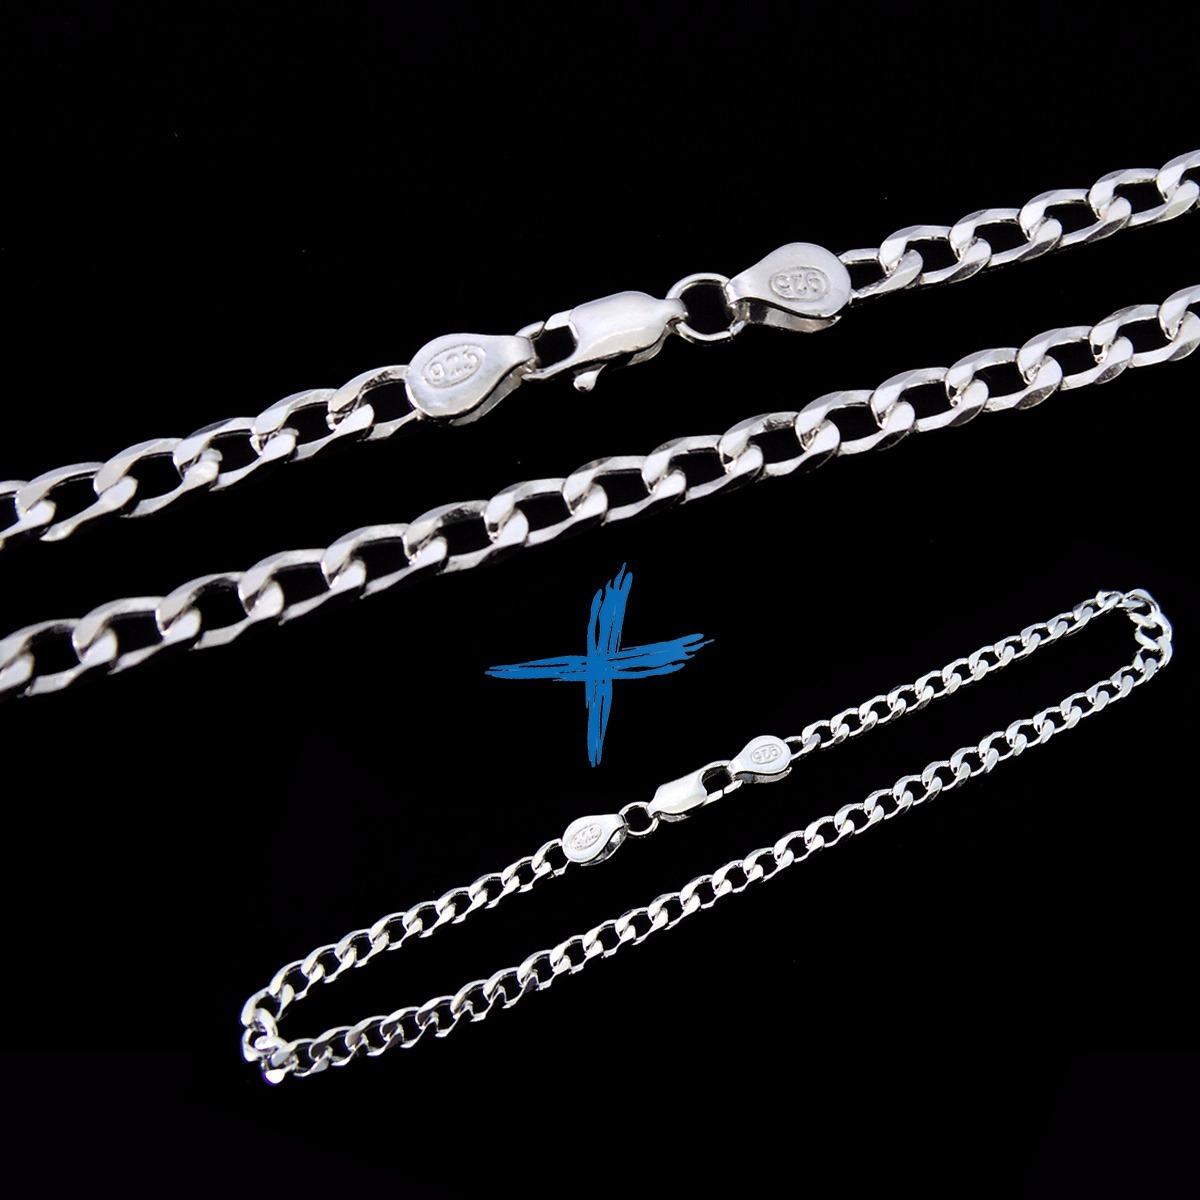 95499c4c719 conjunto kit corrente + pulseira grumet masculino prata 925k. Carregando  zoom.